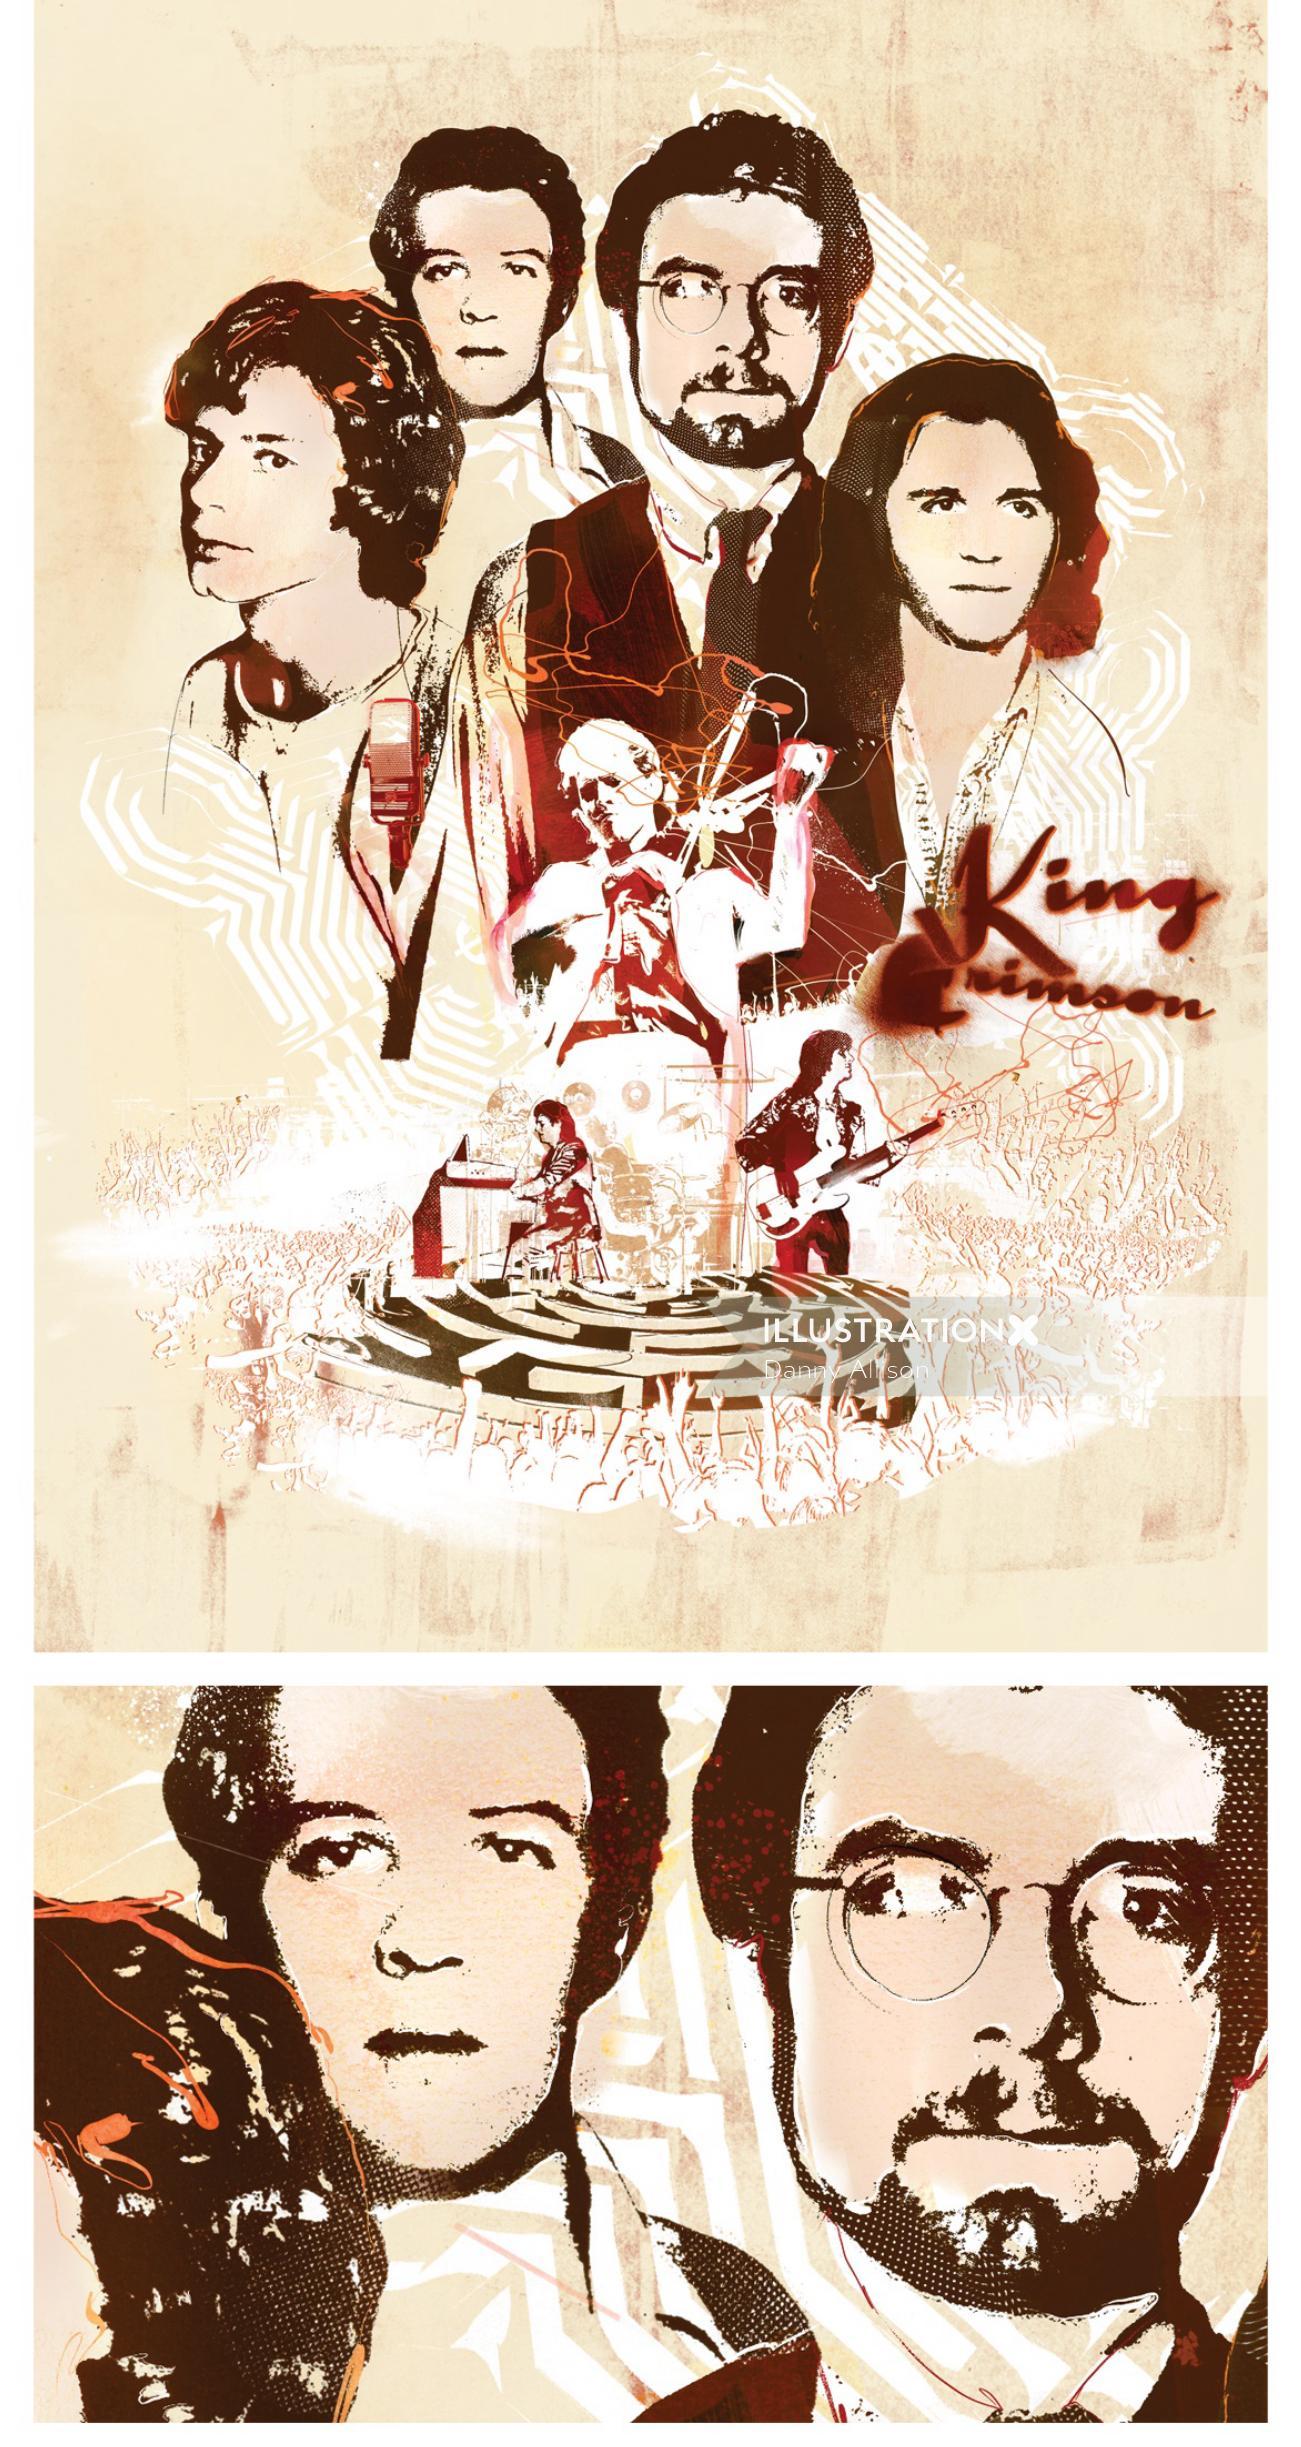 king crimson retro music 60s vintage psychedelic band sepia past rock poeple portrait